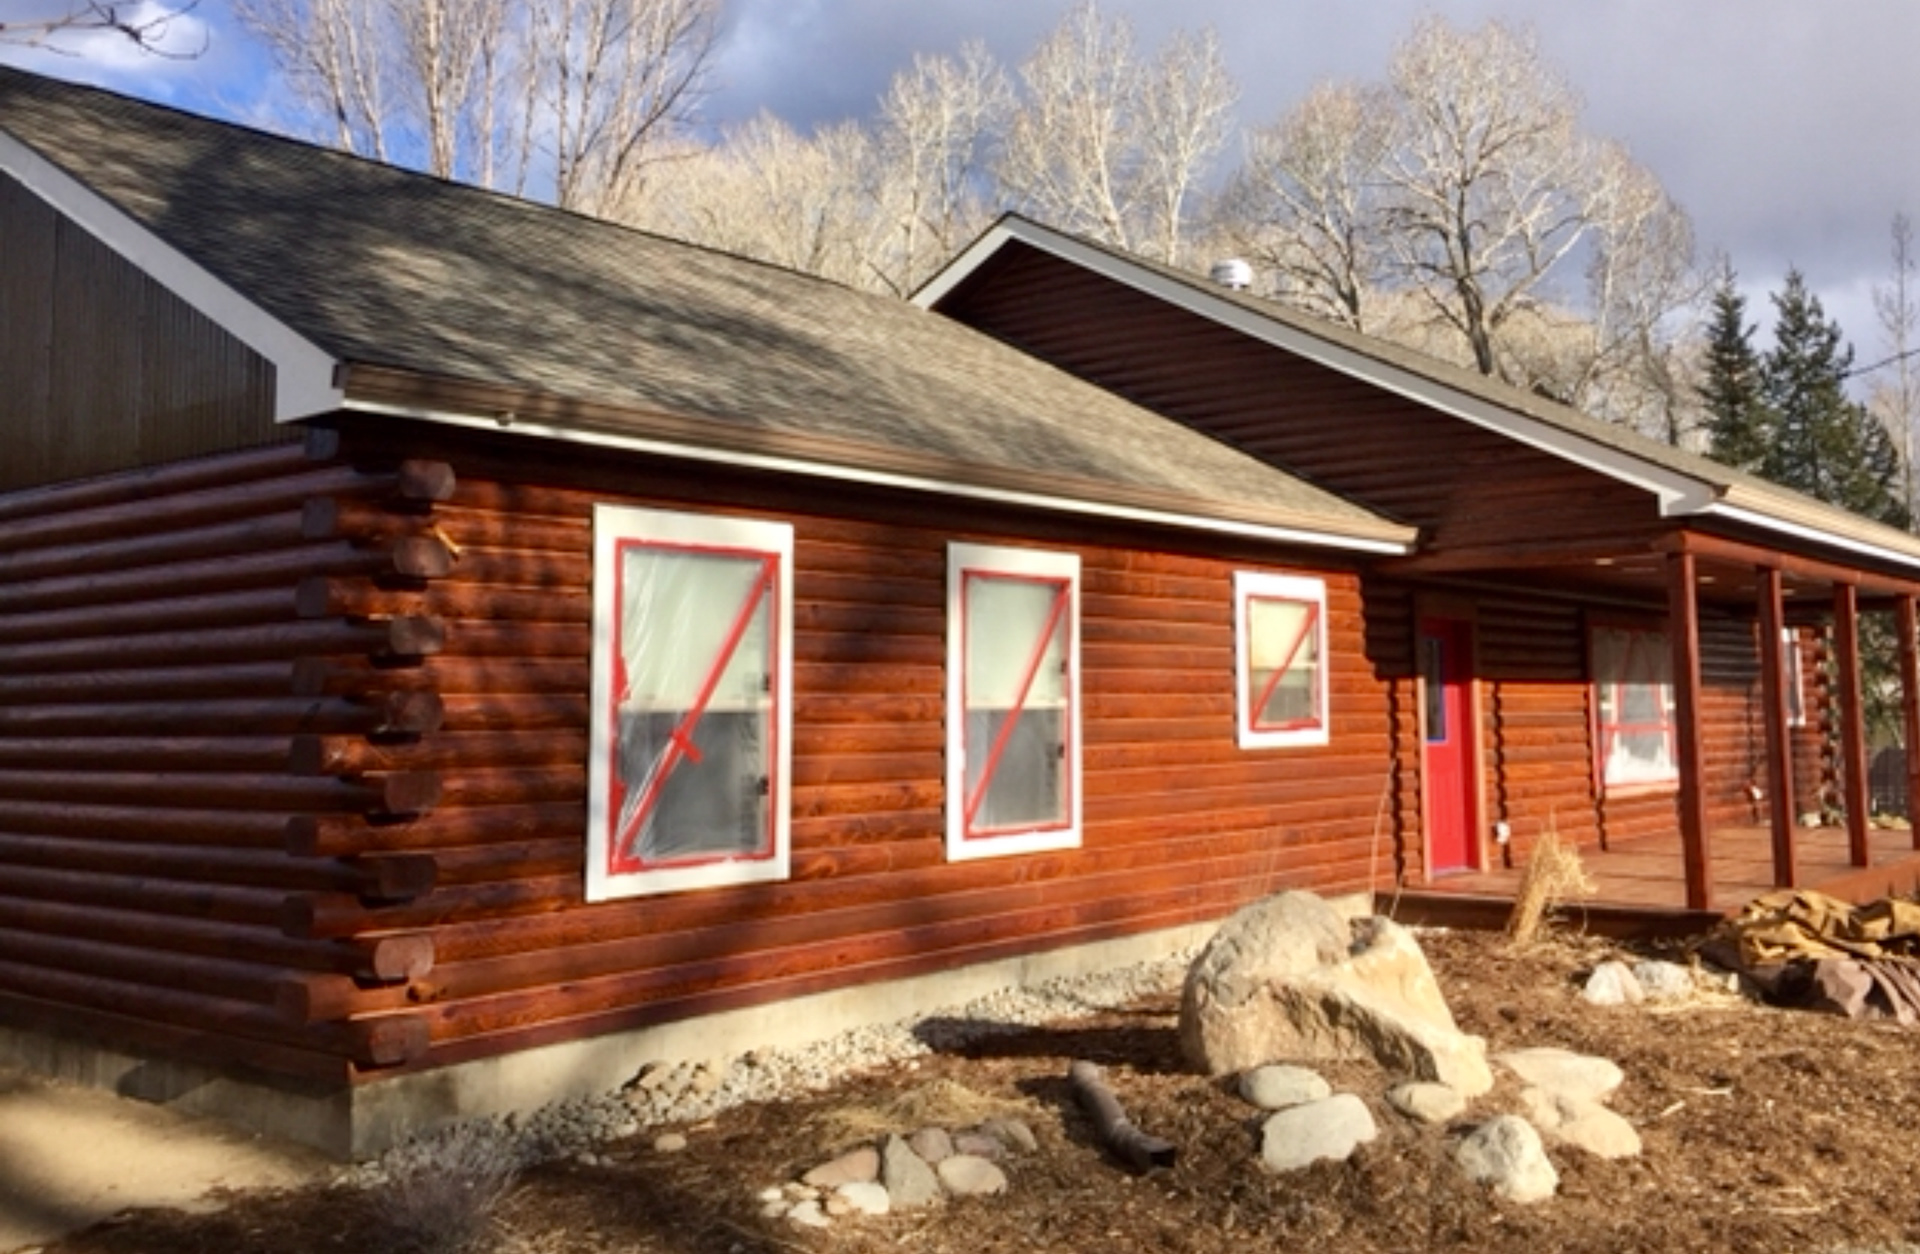 basecampco in state canyon camping colorado cabins gate com denver park golden campground letir